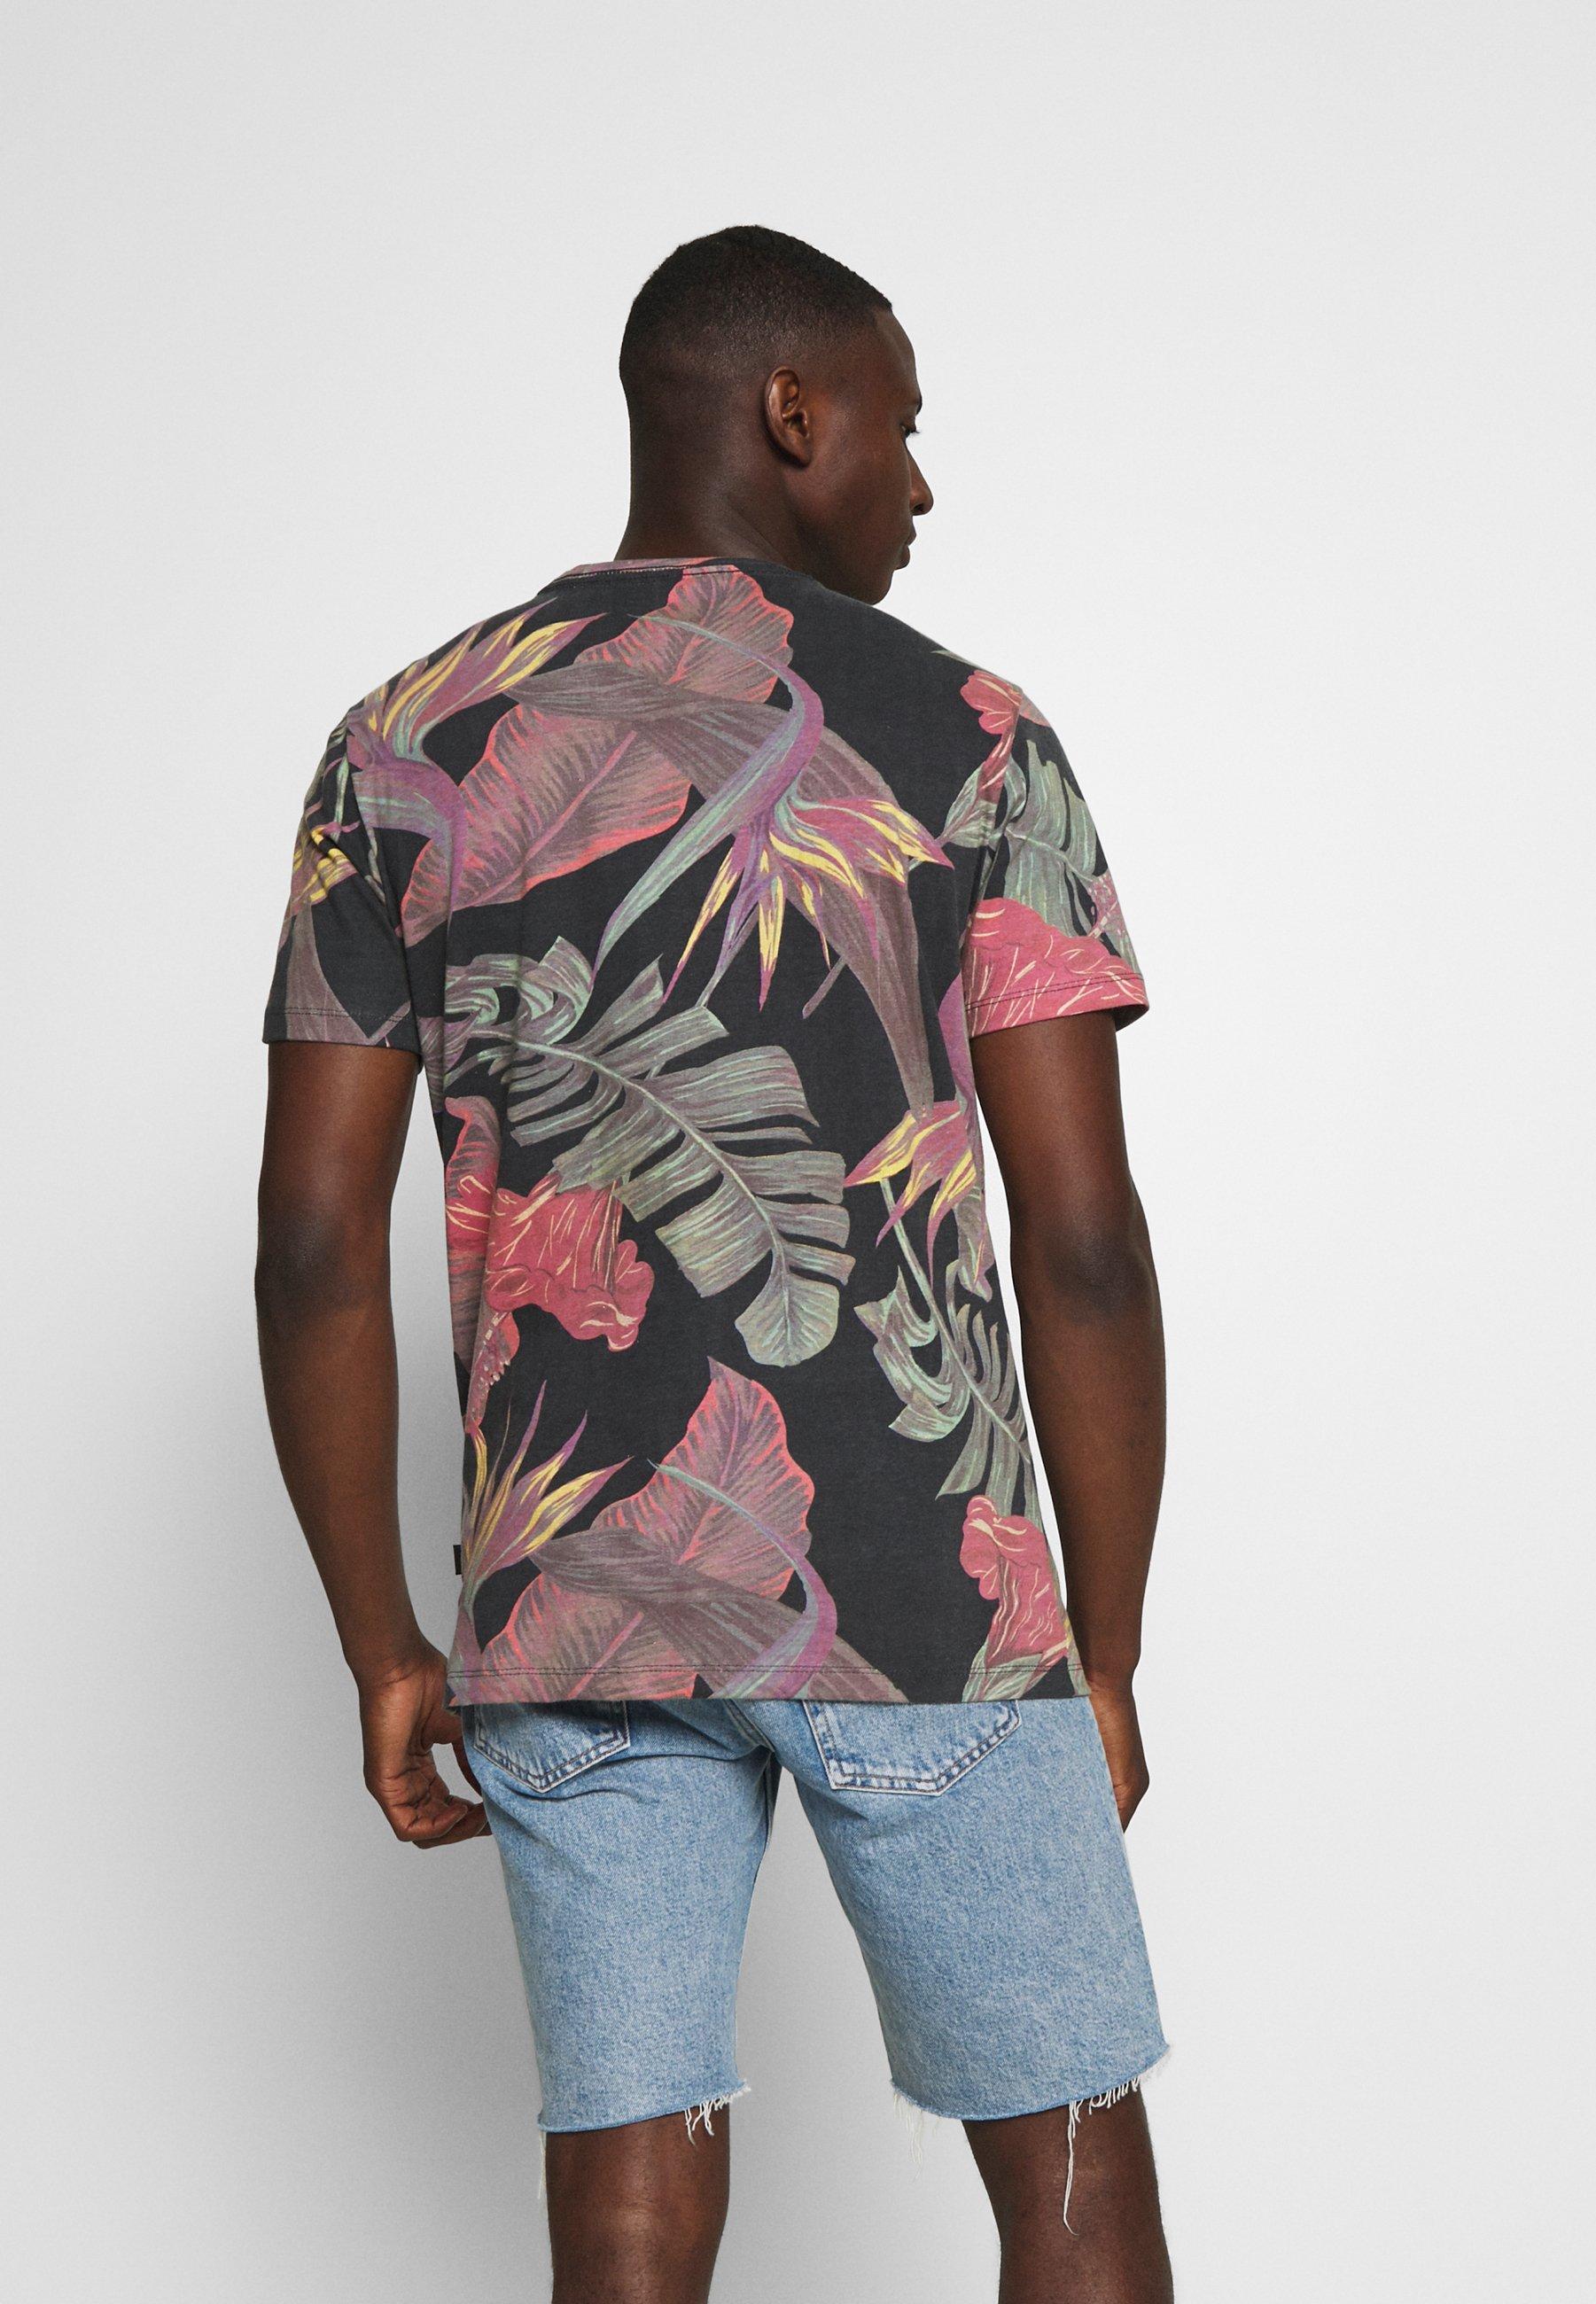 Blend Print T-shirt - dark navy blue iCw4f